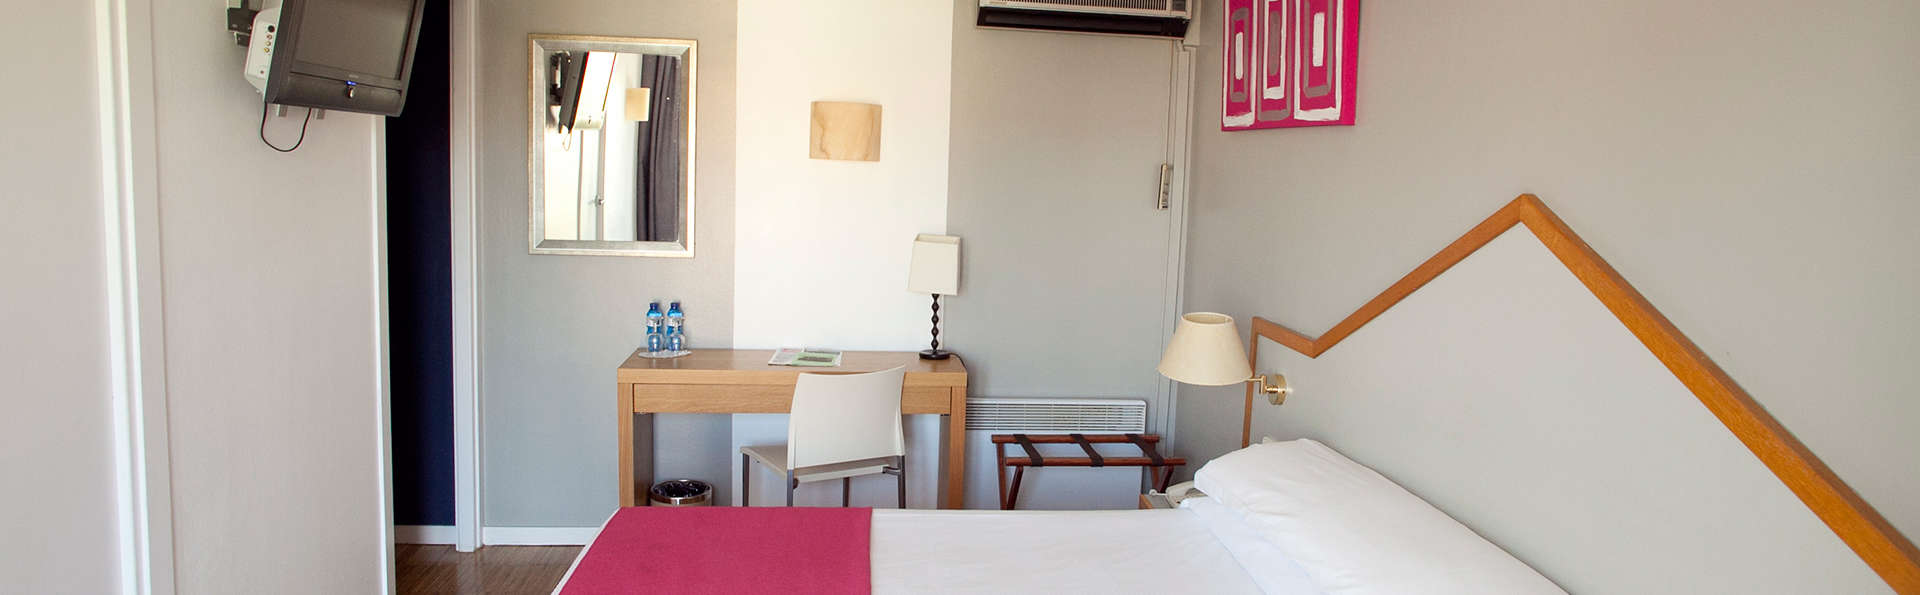 Hotel Subur - EDIT_room.jpg